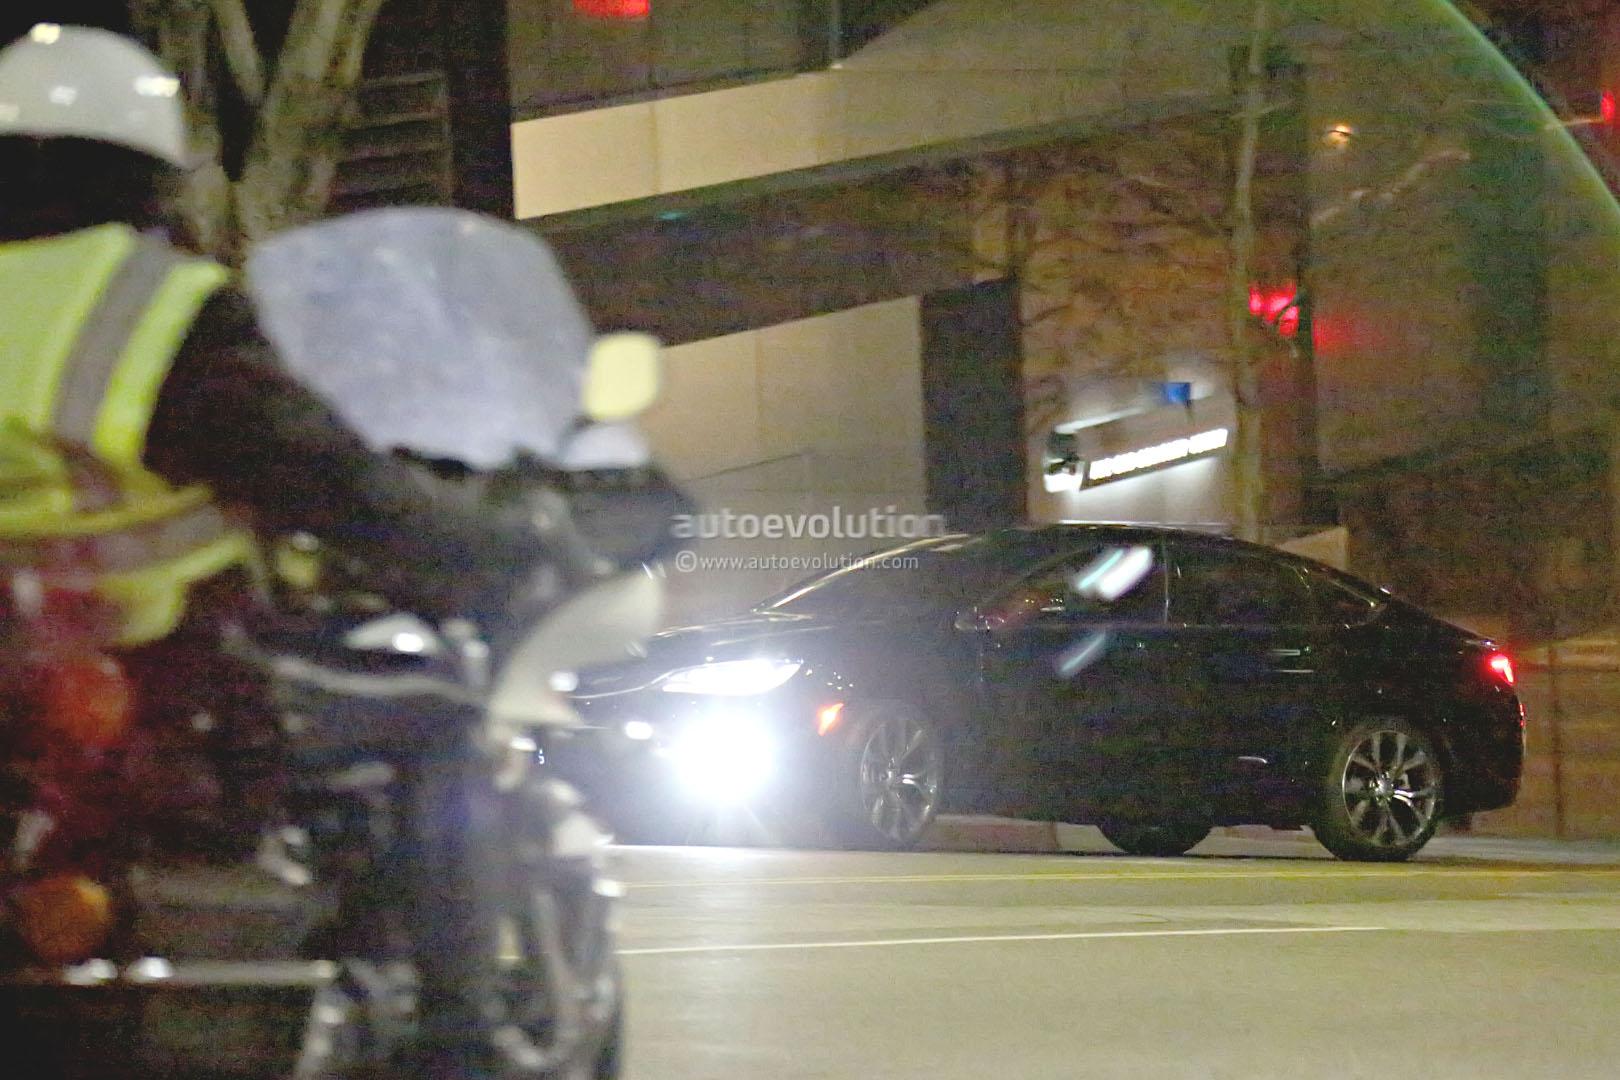 2015 Chrysler 200 Spy Photos 2015 chrysler 200 sedan spy